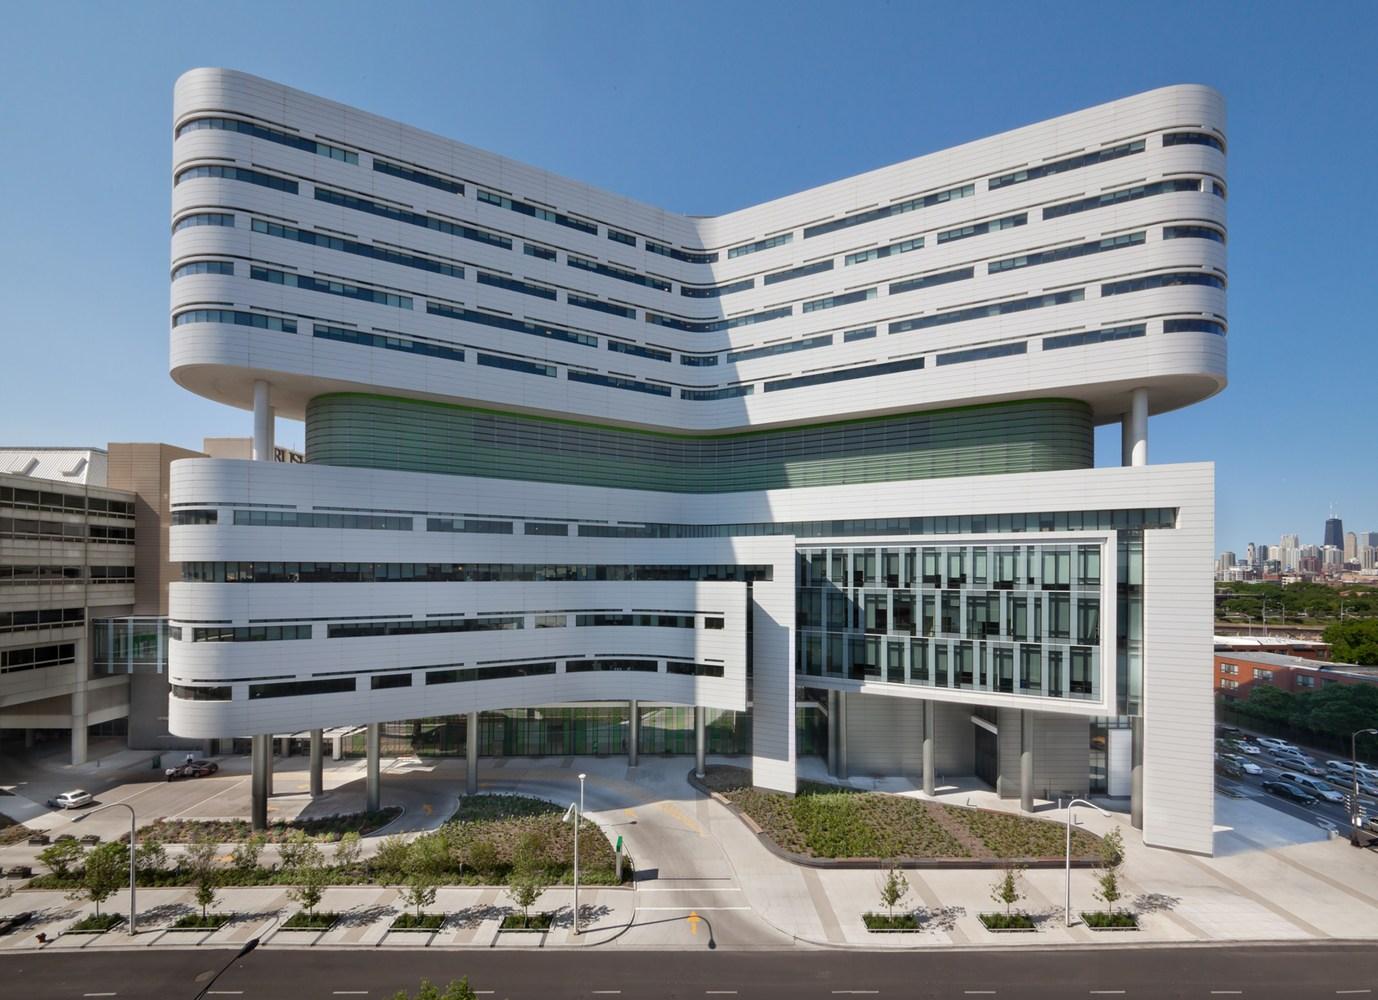 Gallery of New Hospital Tower Rush University Medical Center